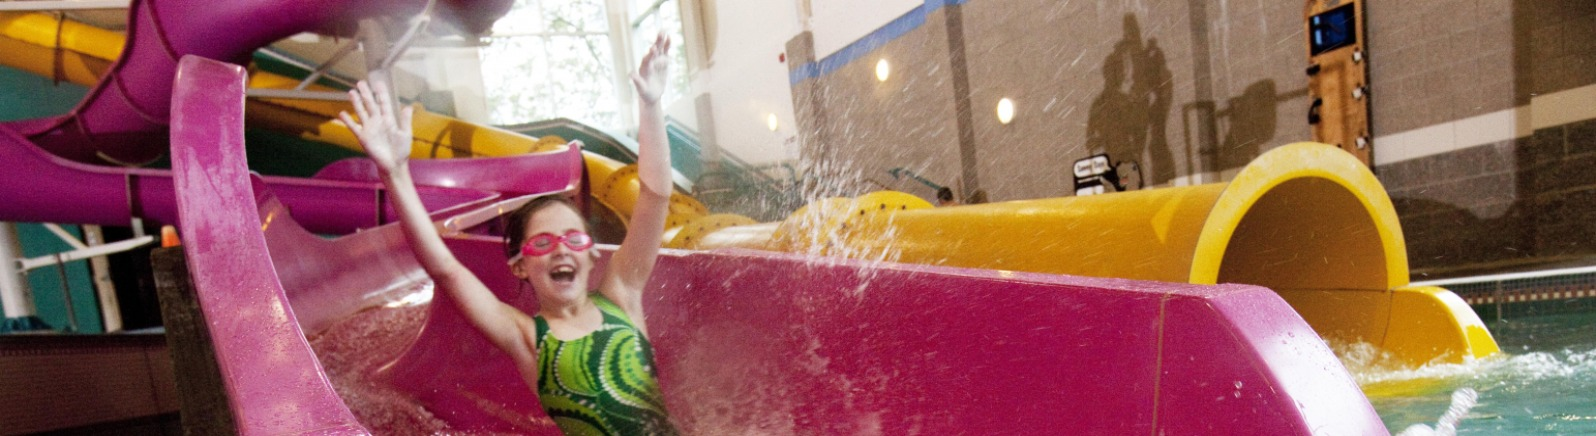 North Clackamas Aquatic Park Girl on Slide